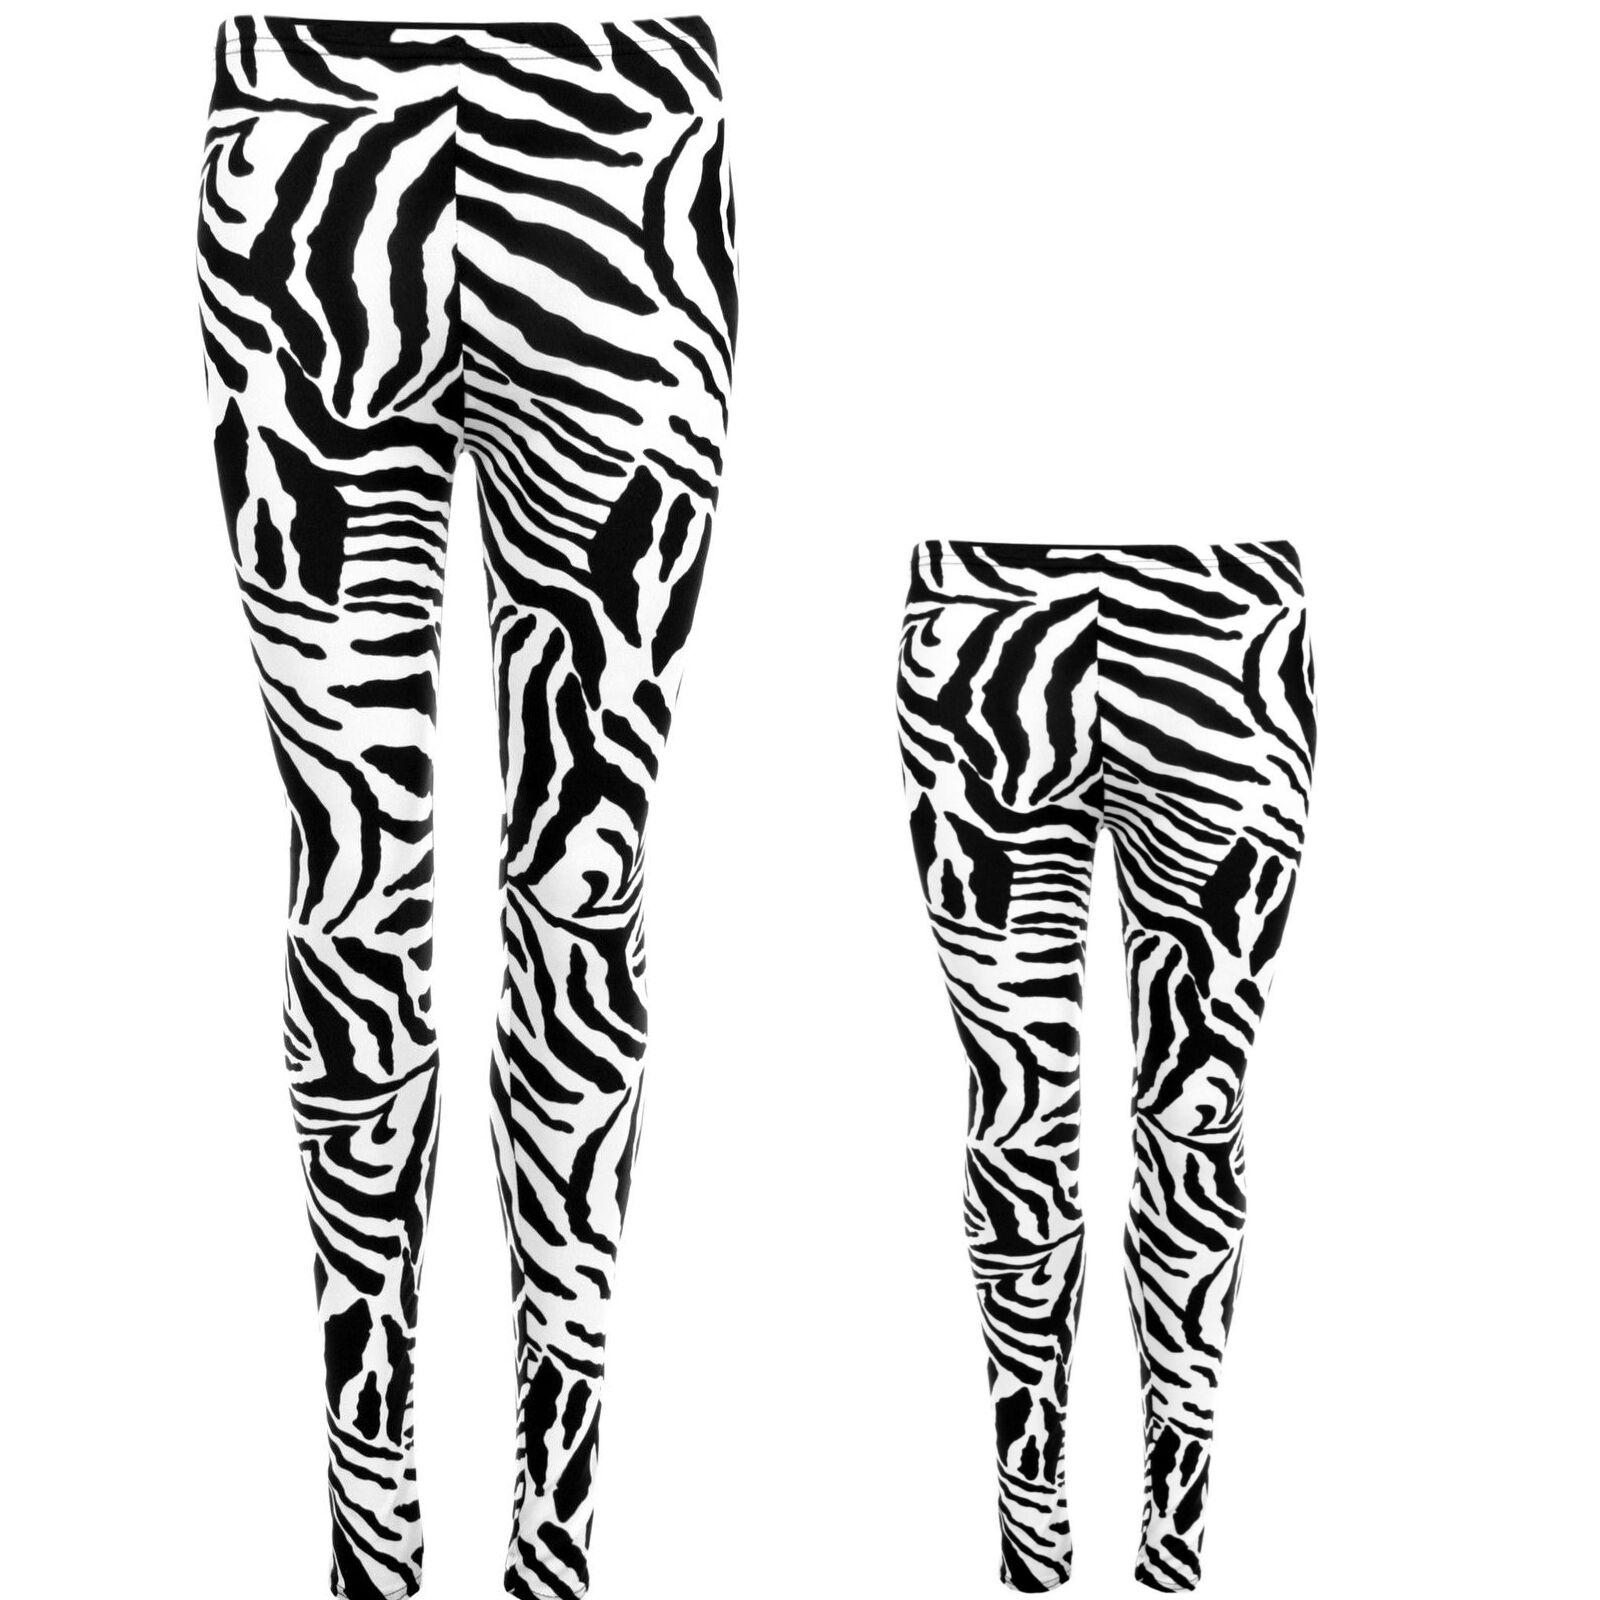 fb9dc7057e0c8 Details about MOTHER & DAUGHTER ZEBRA PRINT LEGGINGS LADIES GIRLS COSTUME  FANCY DRESS PARTY